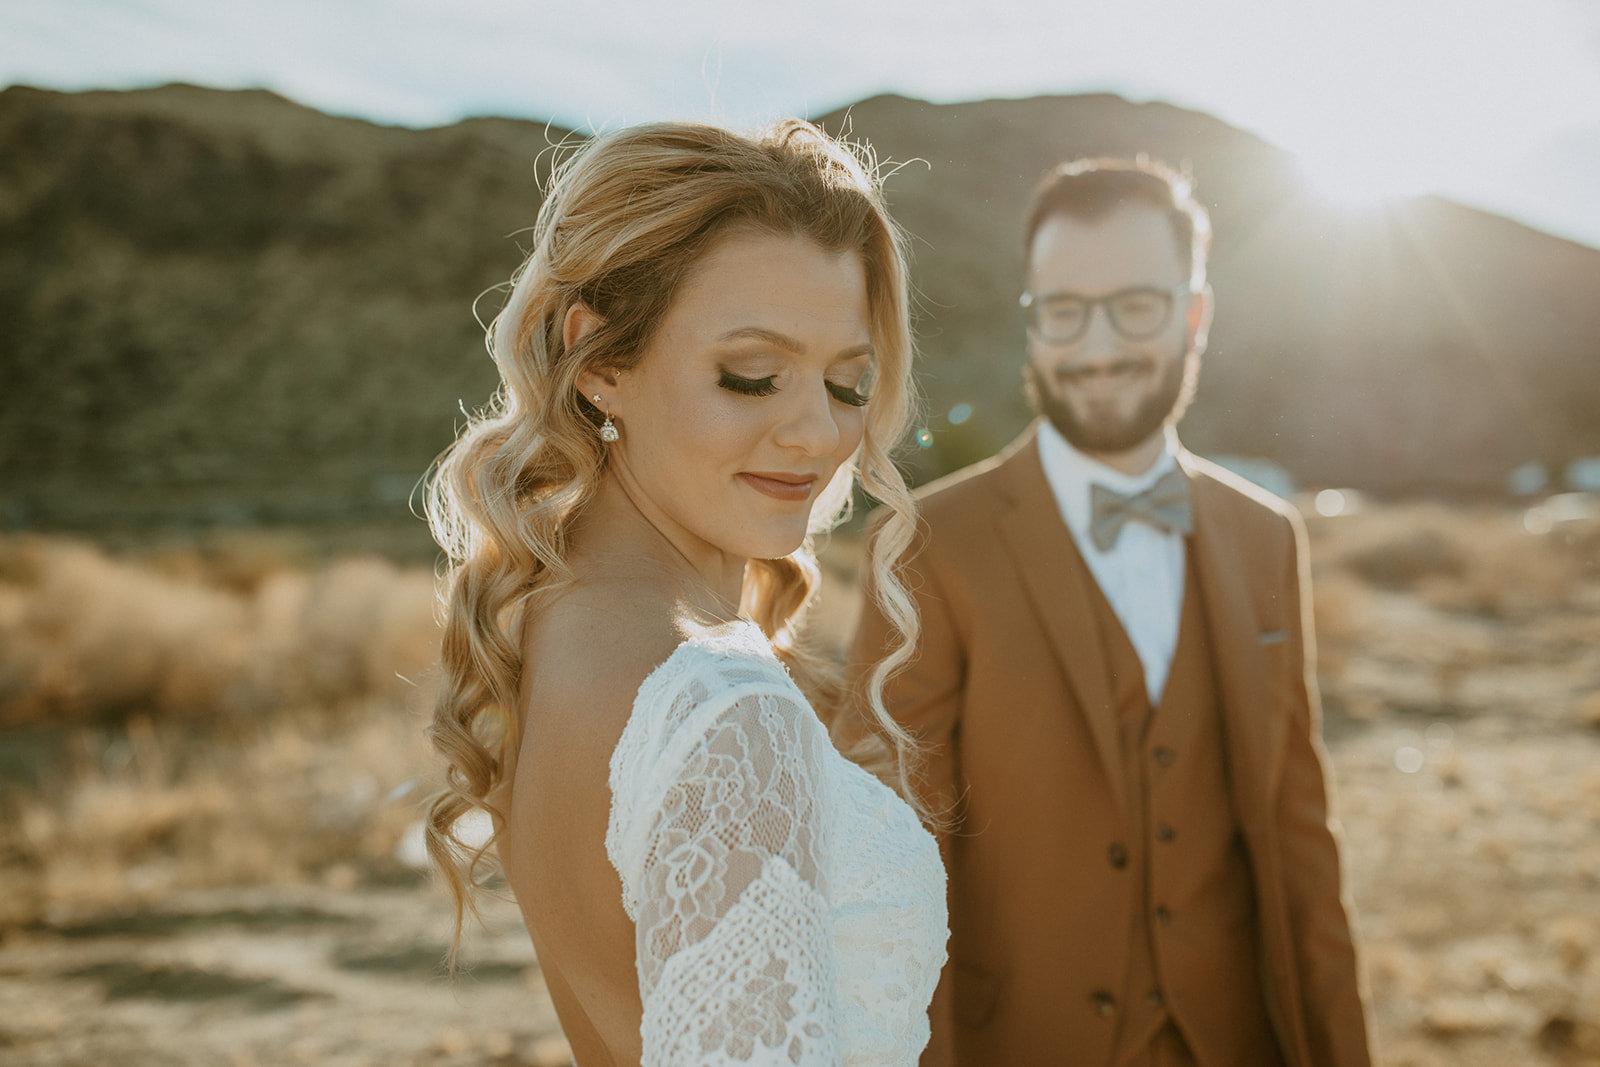 Bridal Makeup and Hair day of wedding